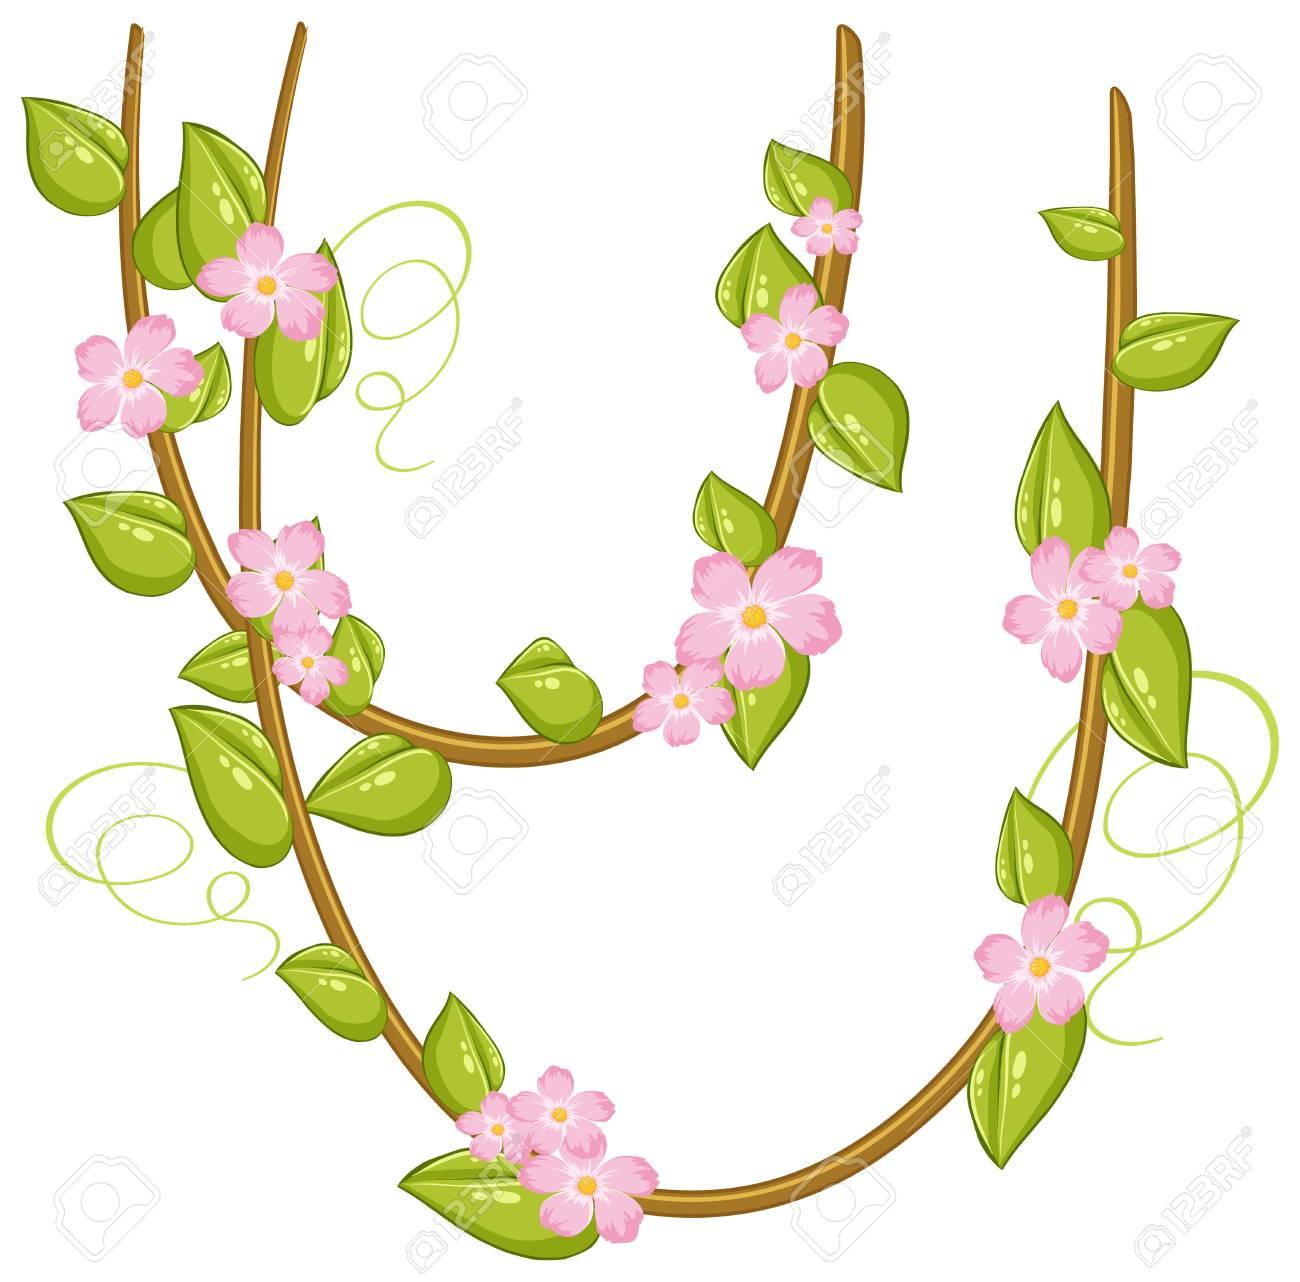 Pink flowers on vines illustration royalty free cliparts vectors pink flowers on vines illustration stock vector 97011920 mightylinksfo